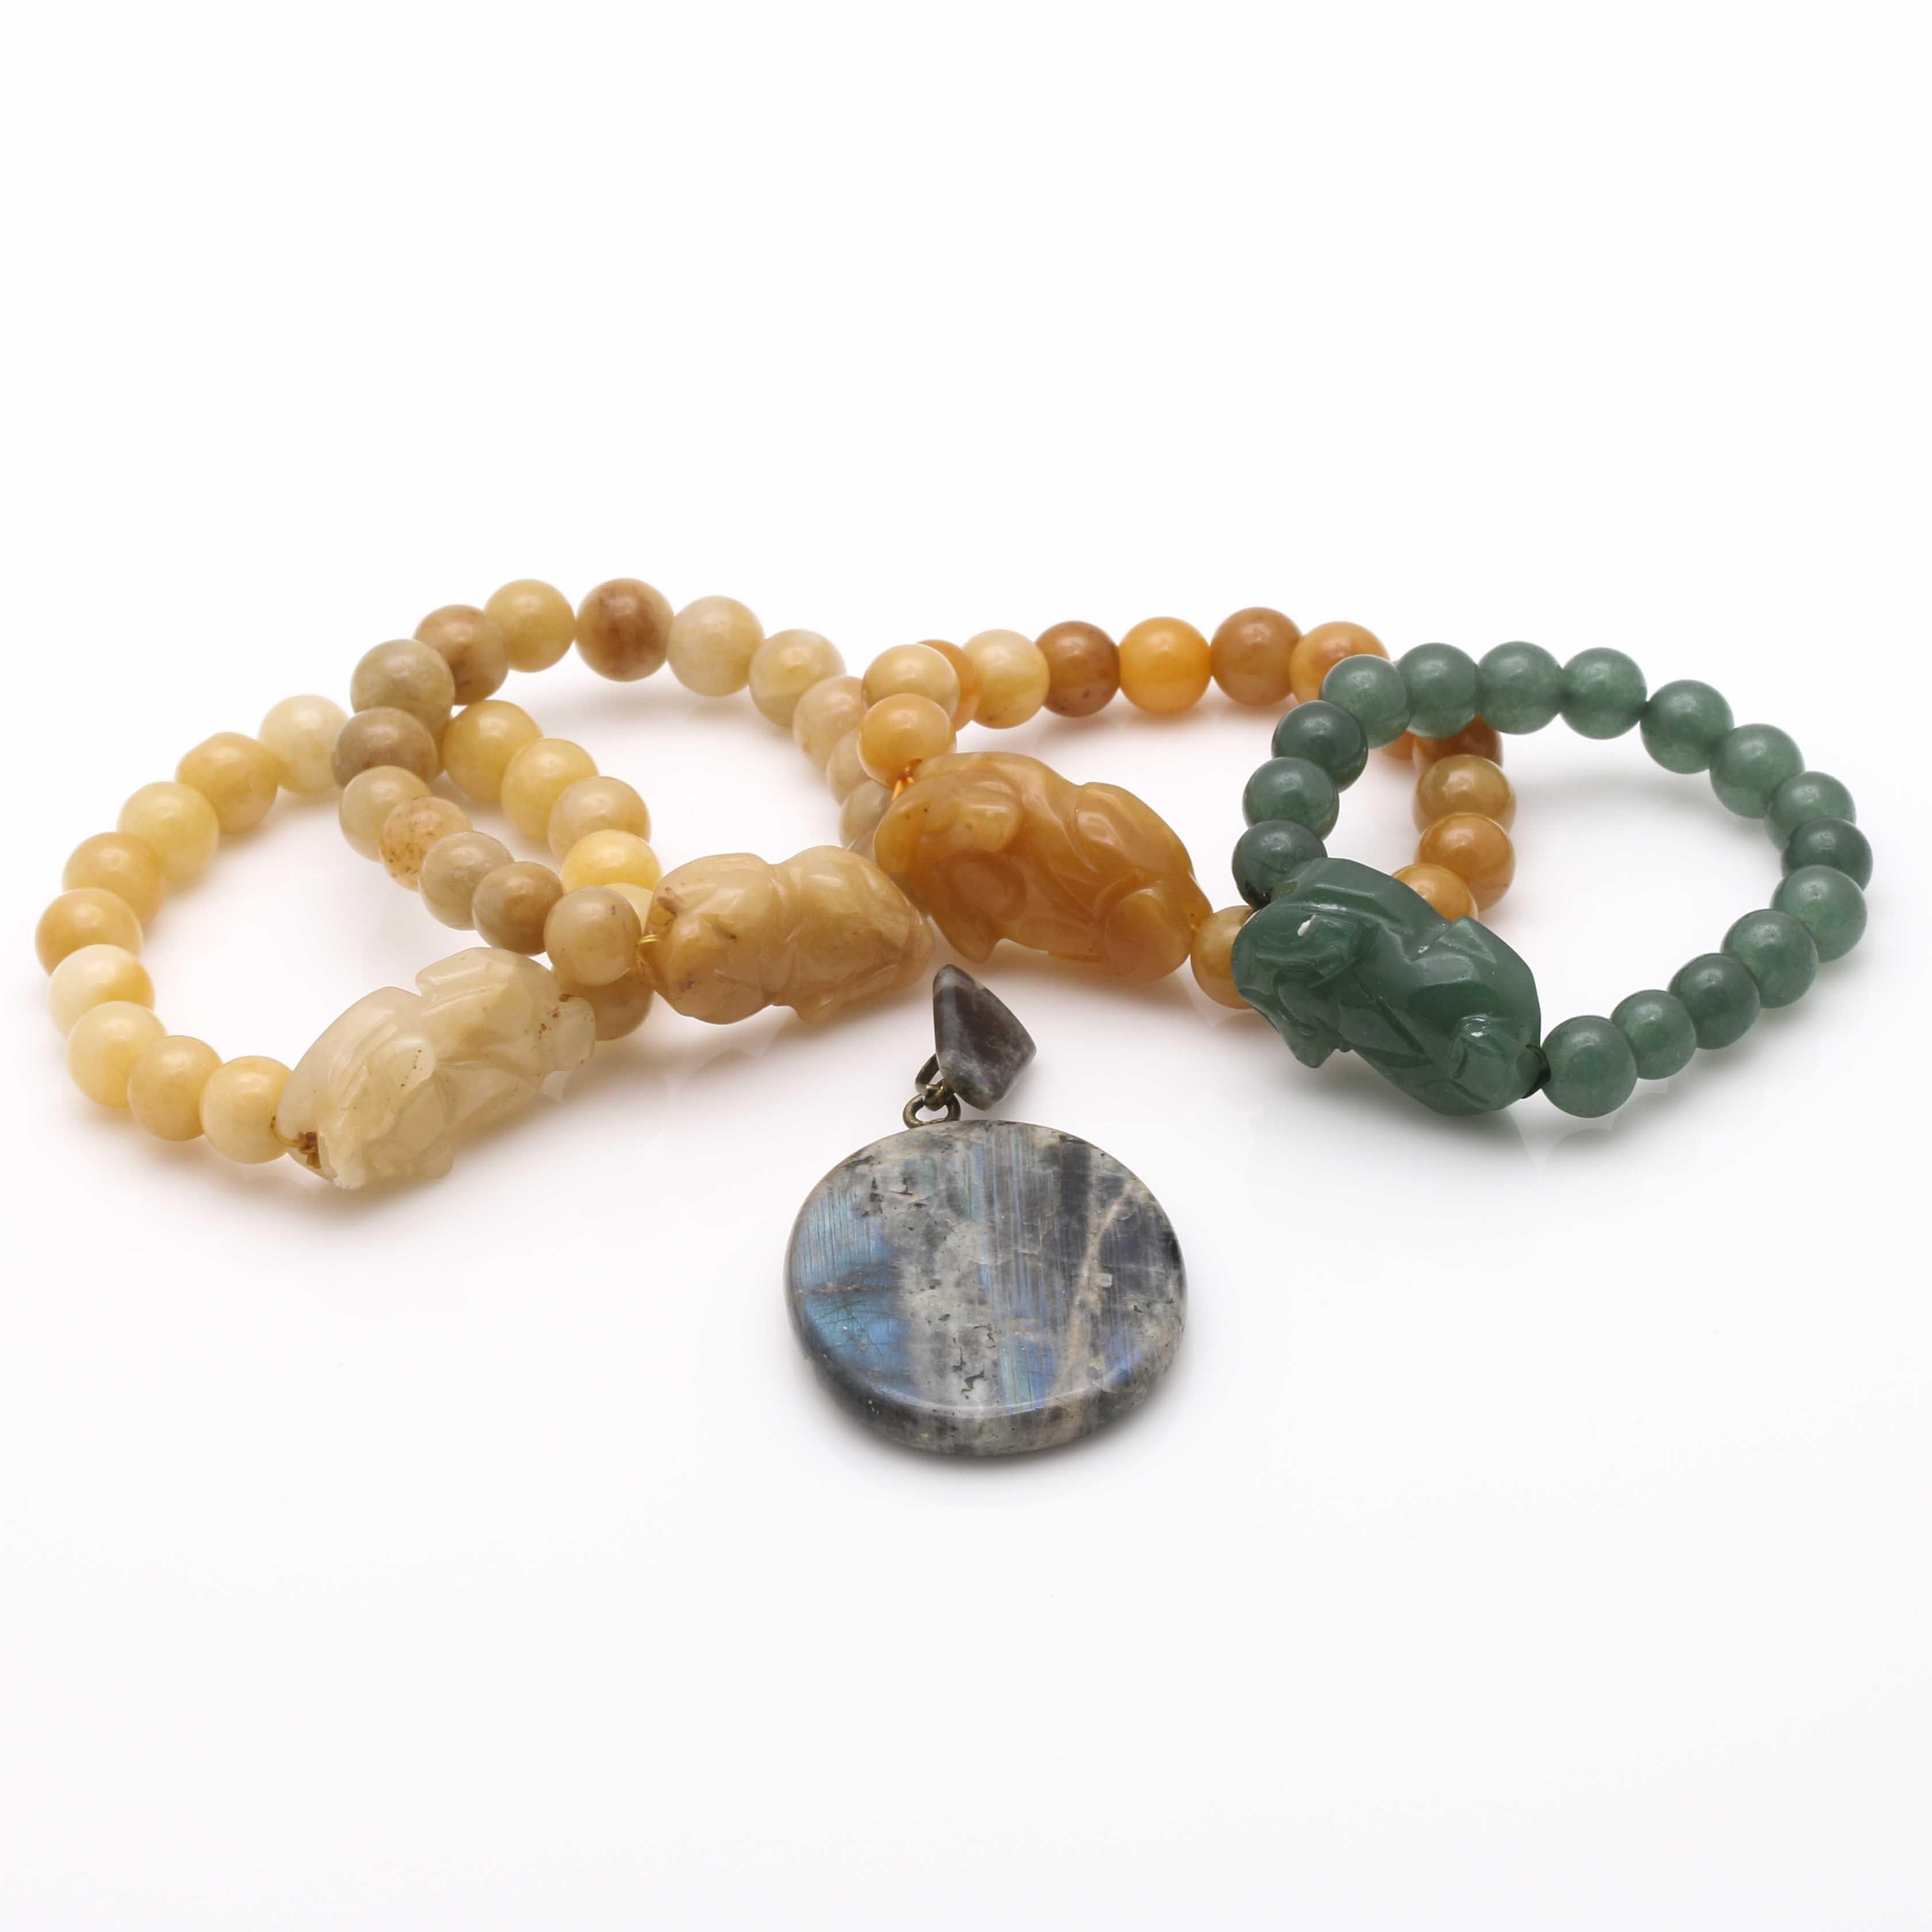 Labradorite and Quartzite Stone Jewelry